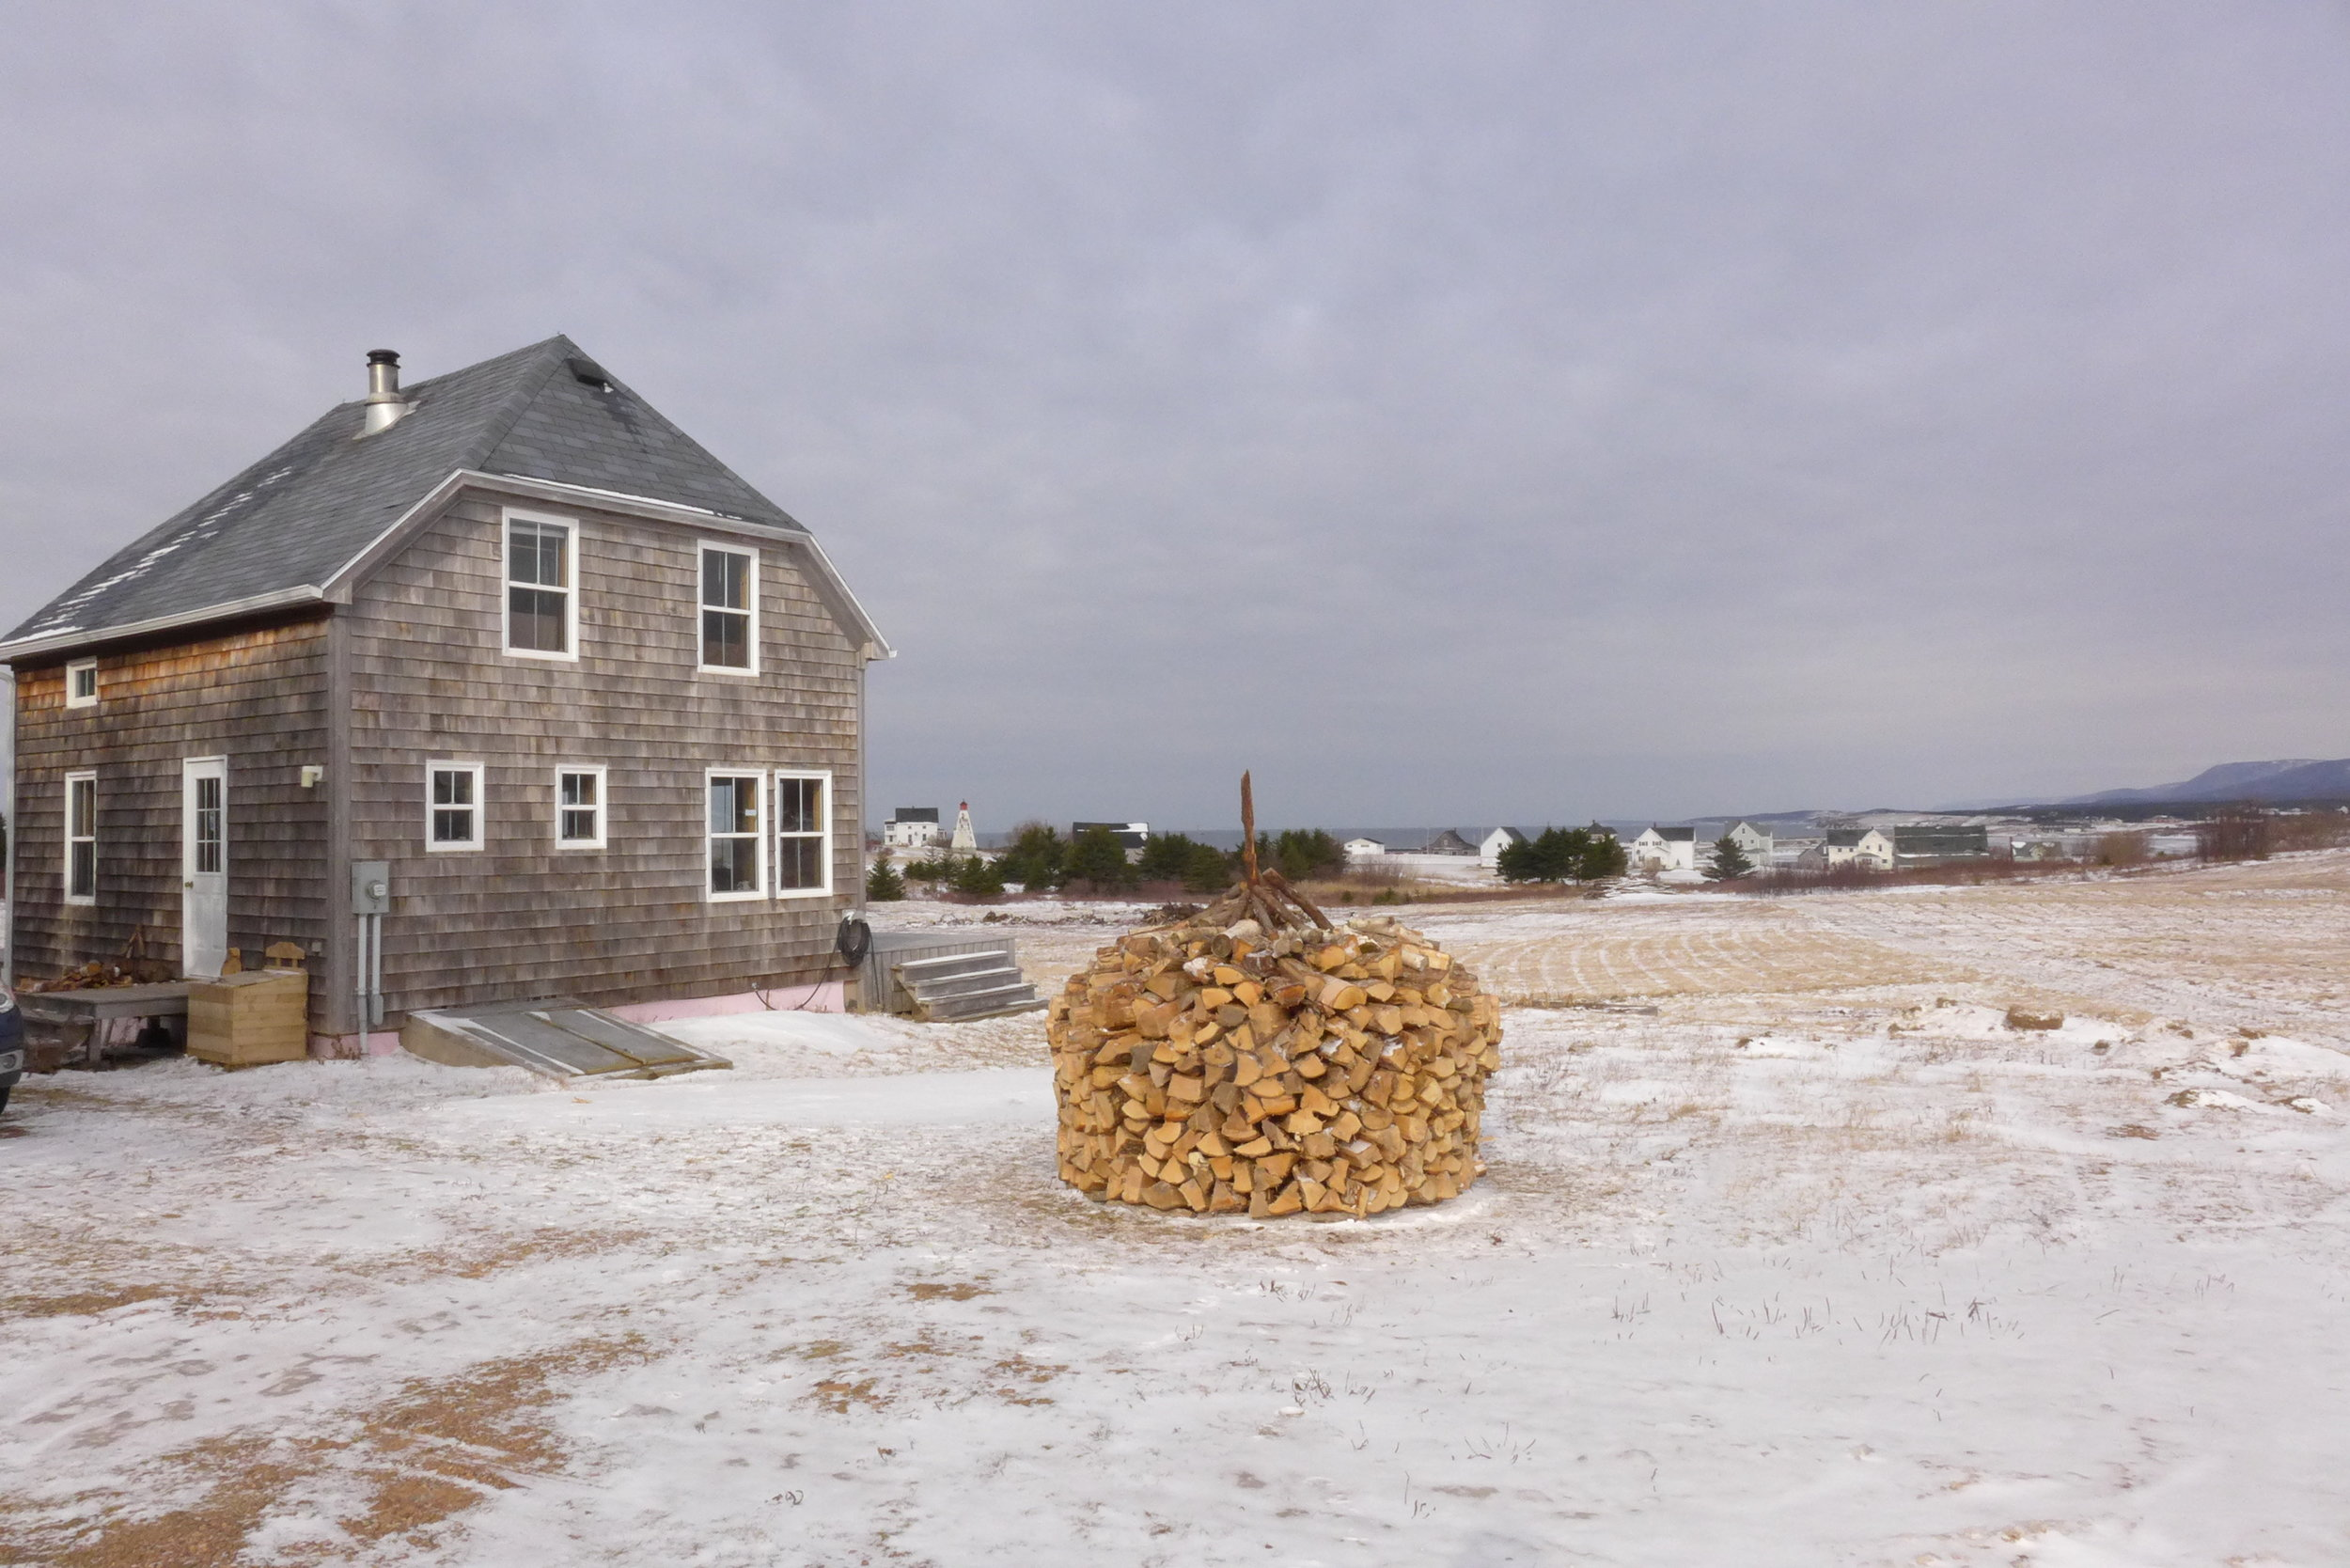 Cape Breton: Holz Hausen (end) 2015